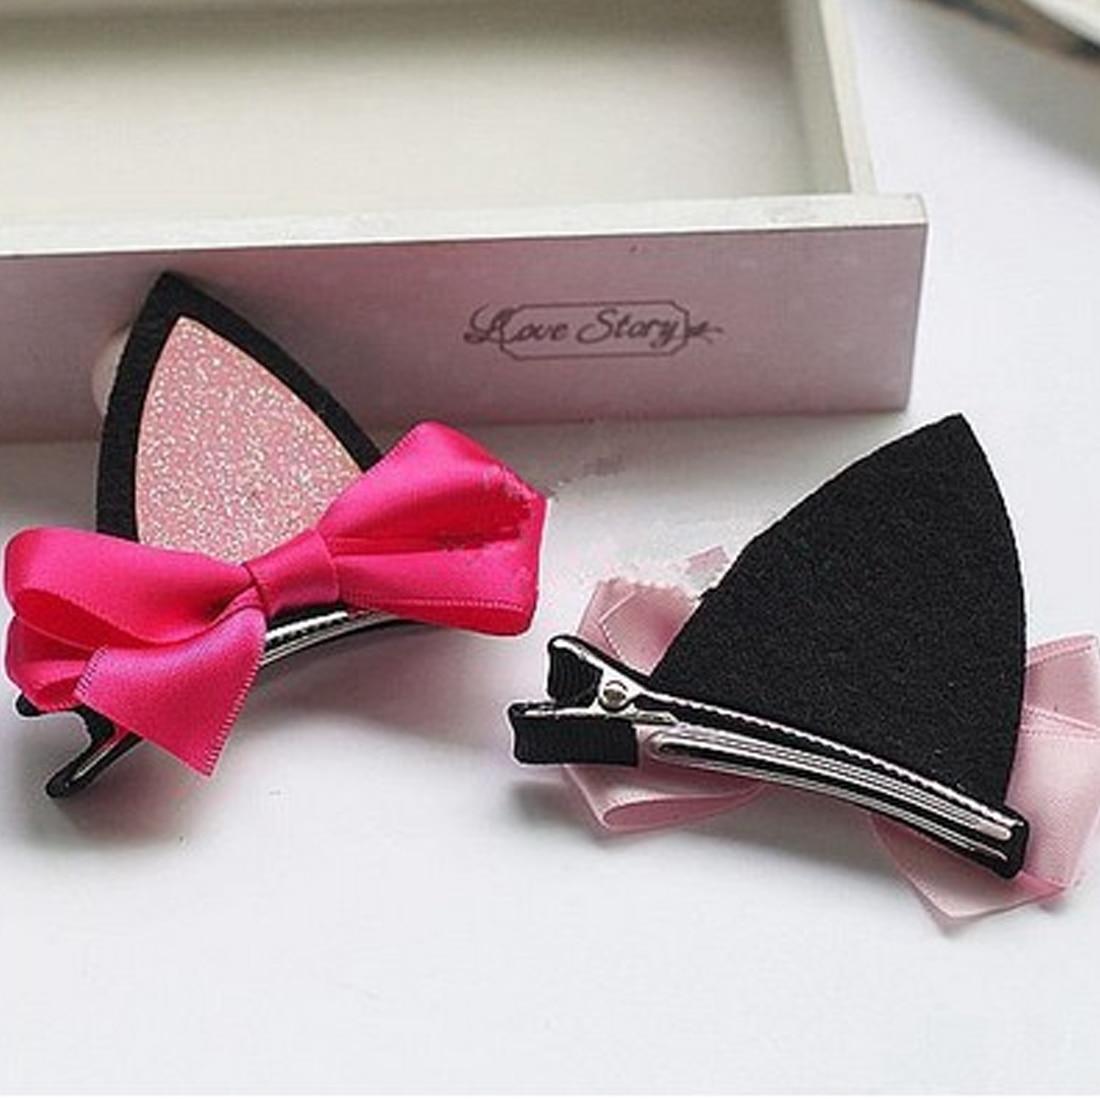 2PCS=1 Pair Children Girls Hair Accessories Clip Kids Hairpins Barrettes Bow Headwear Flower Cat Ears Hairpin Hair Accessories